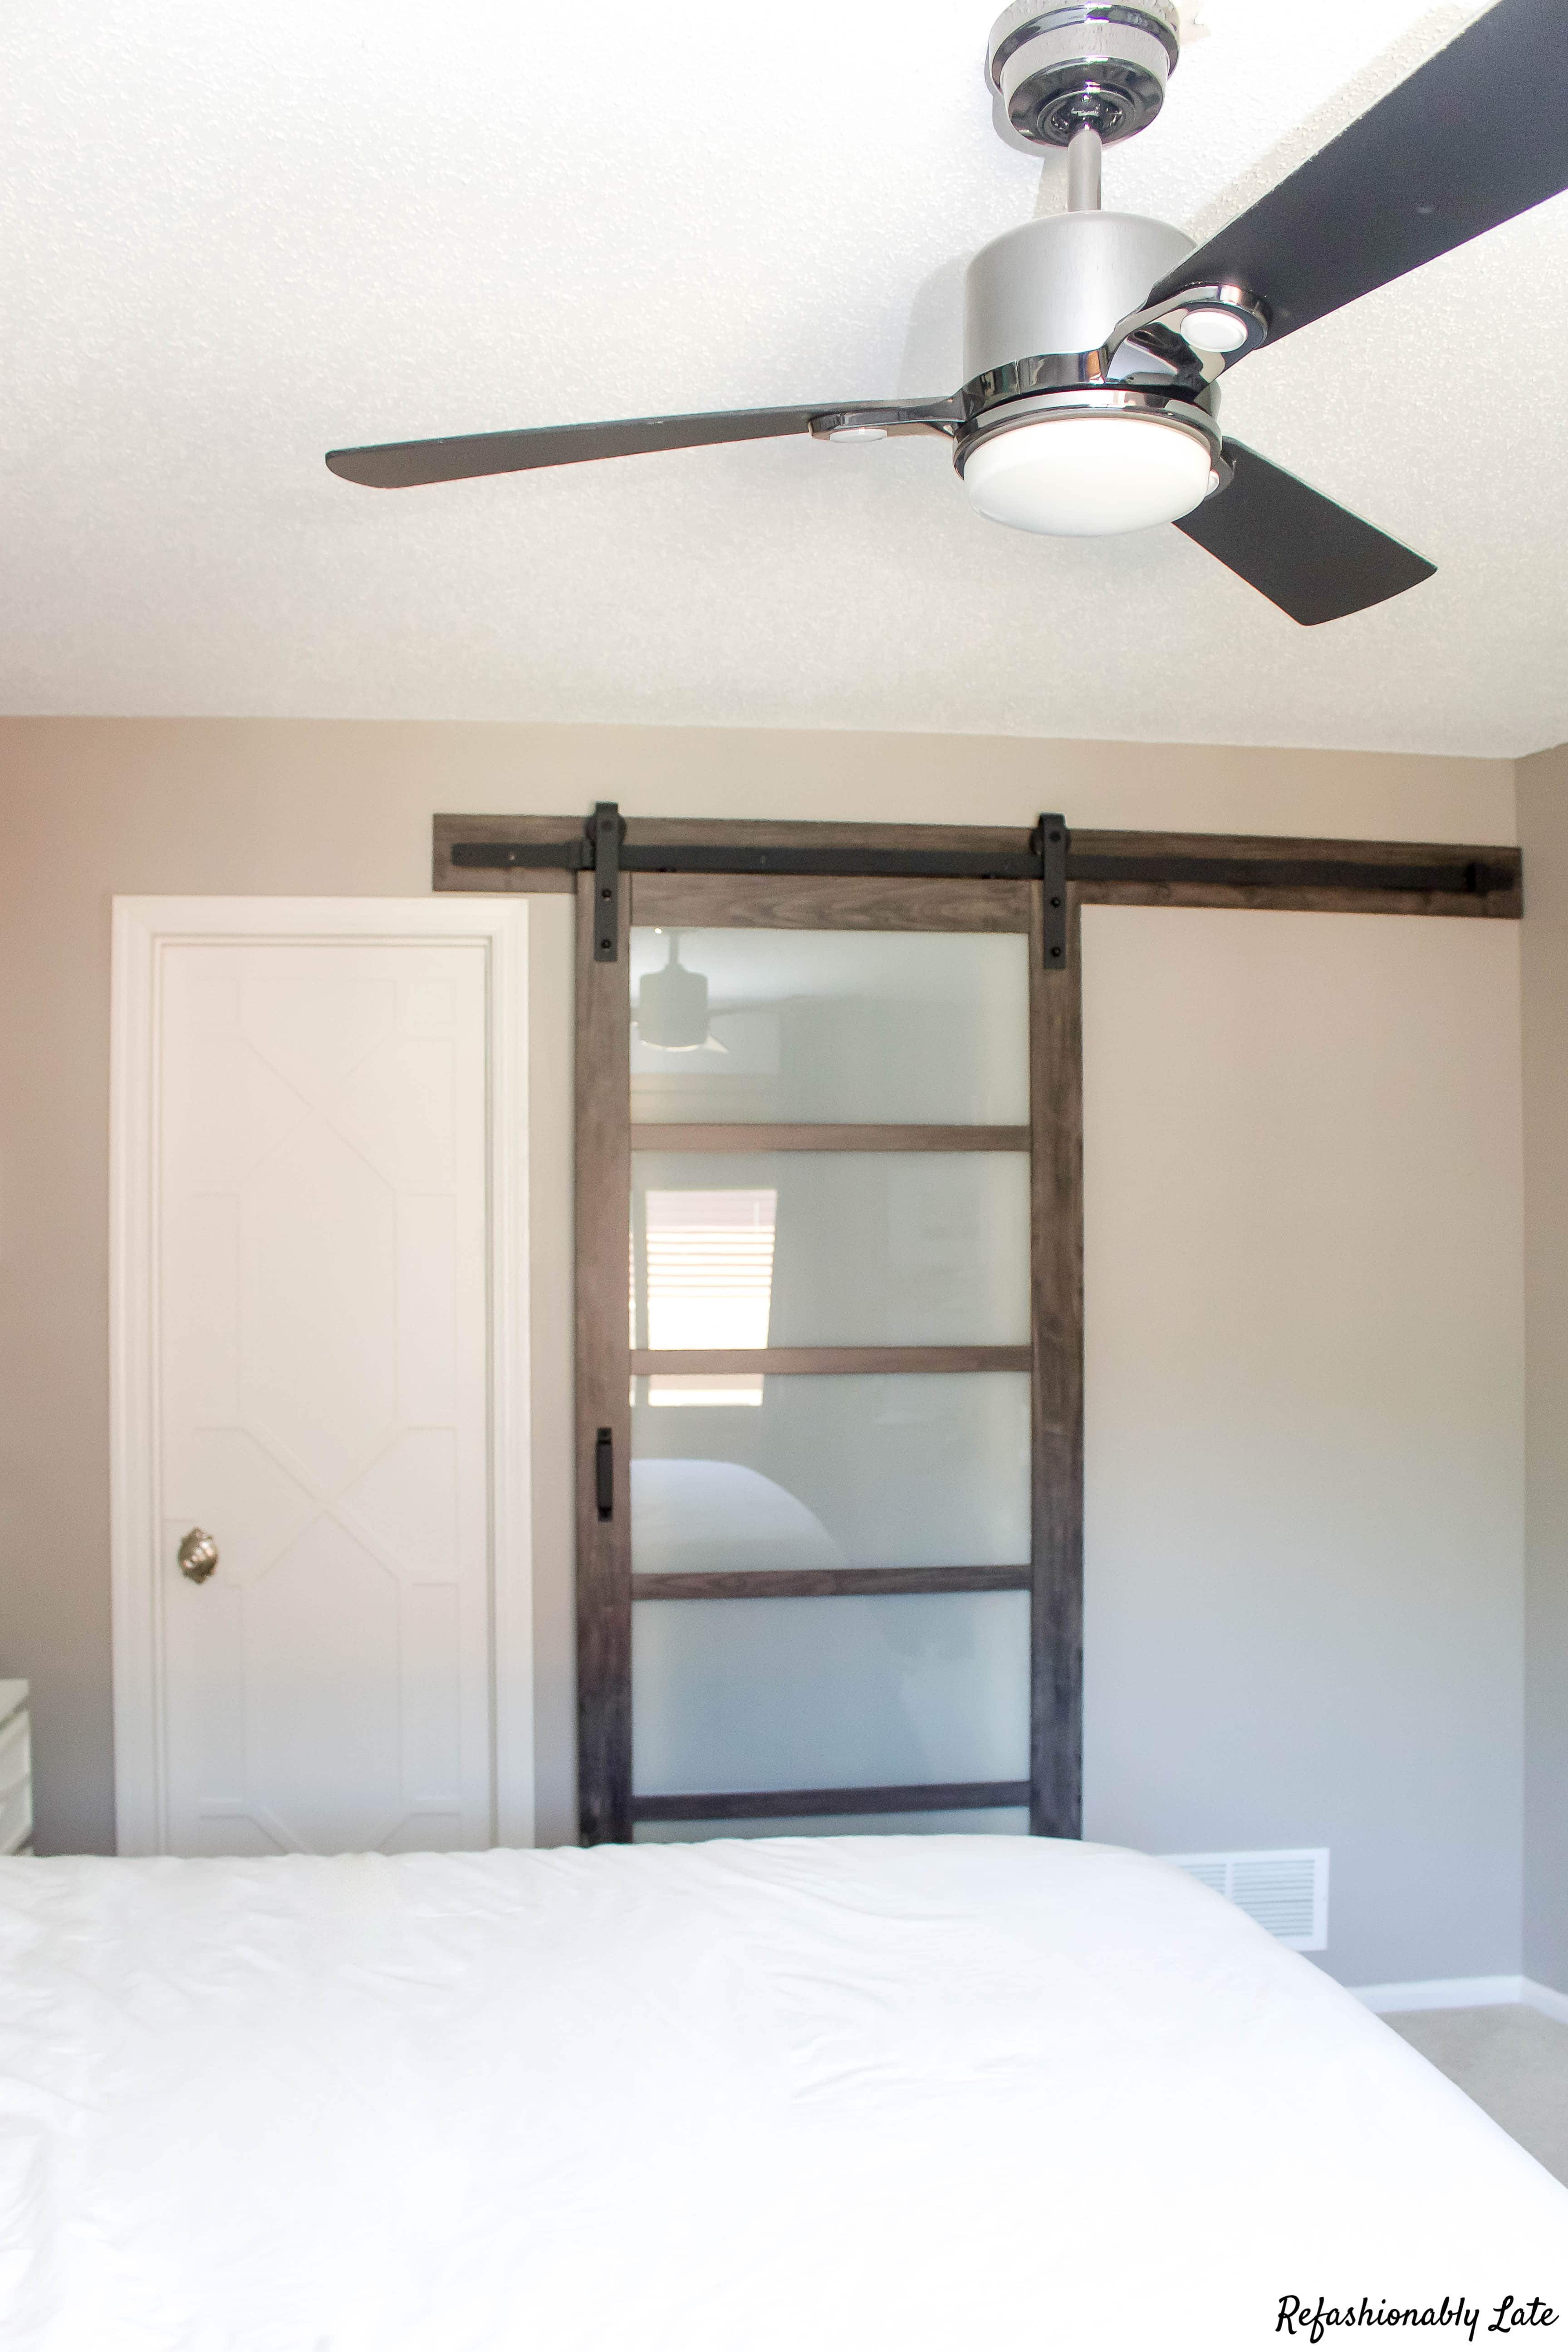 I Finally Got a Barn Door - www.refashionablylate.com